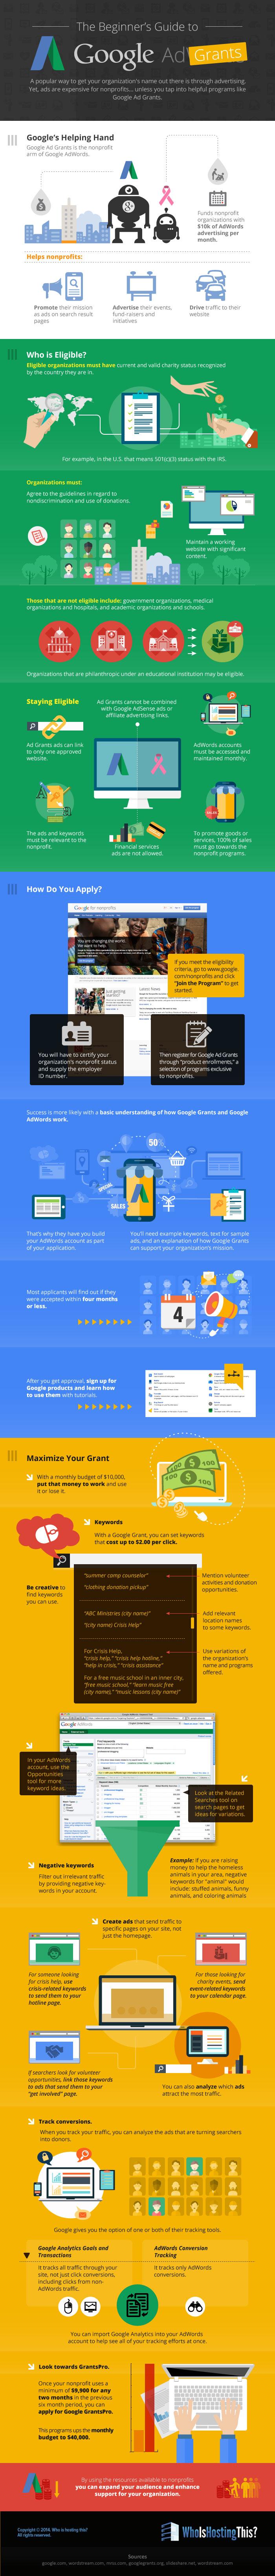 Google Ad Grants non profit organizations